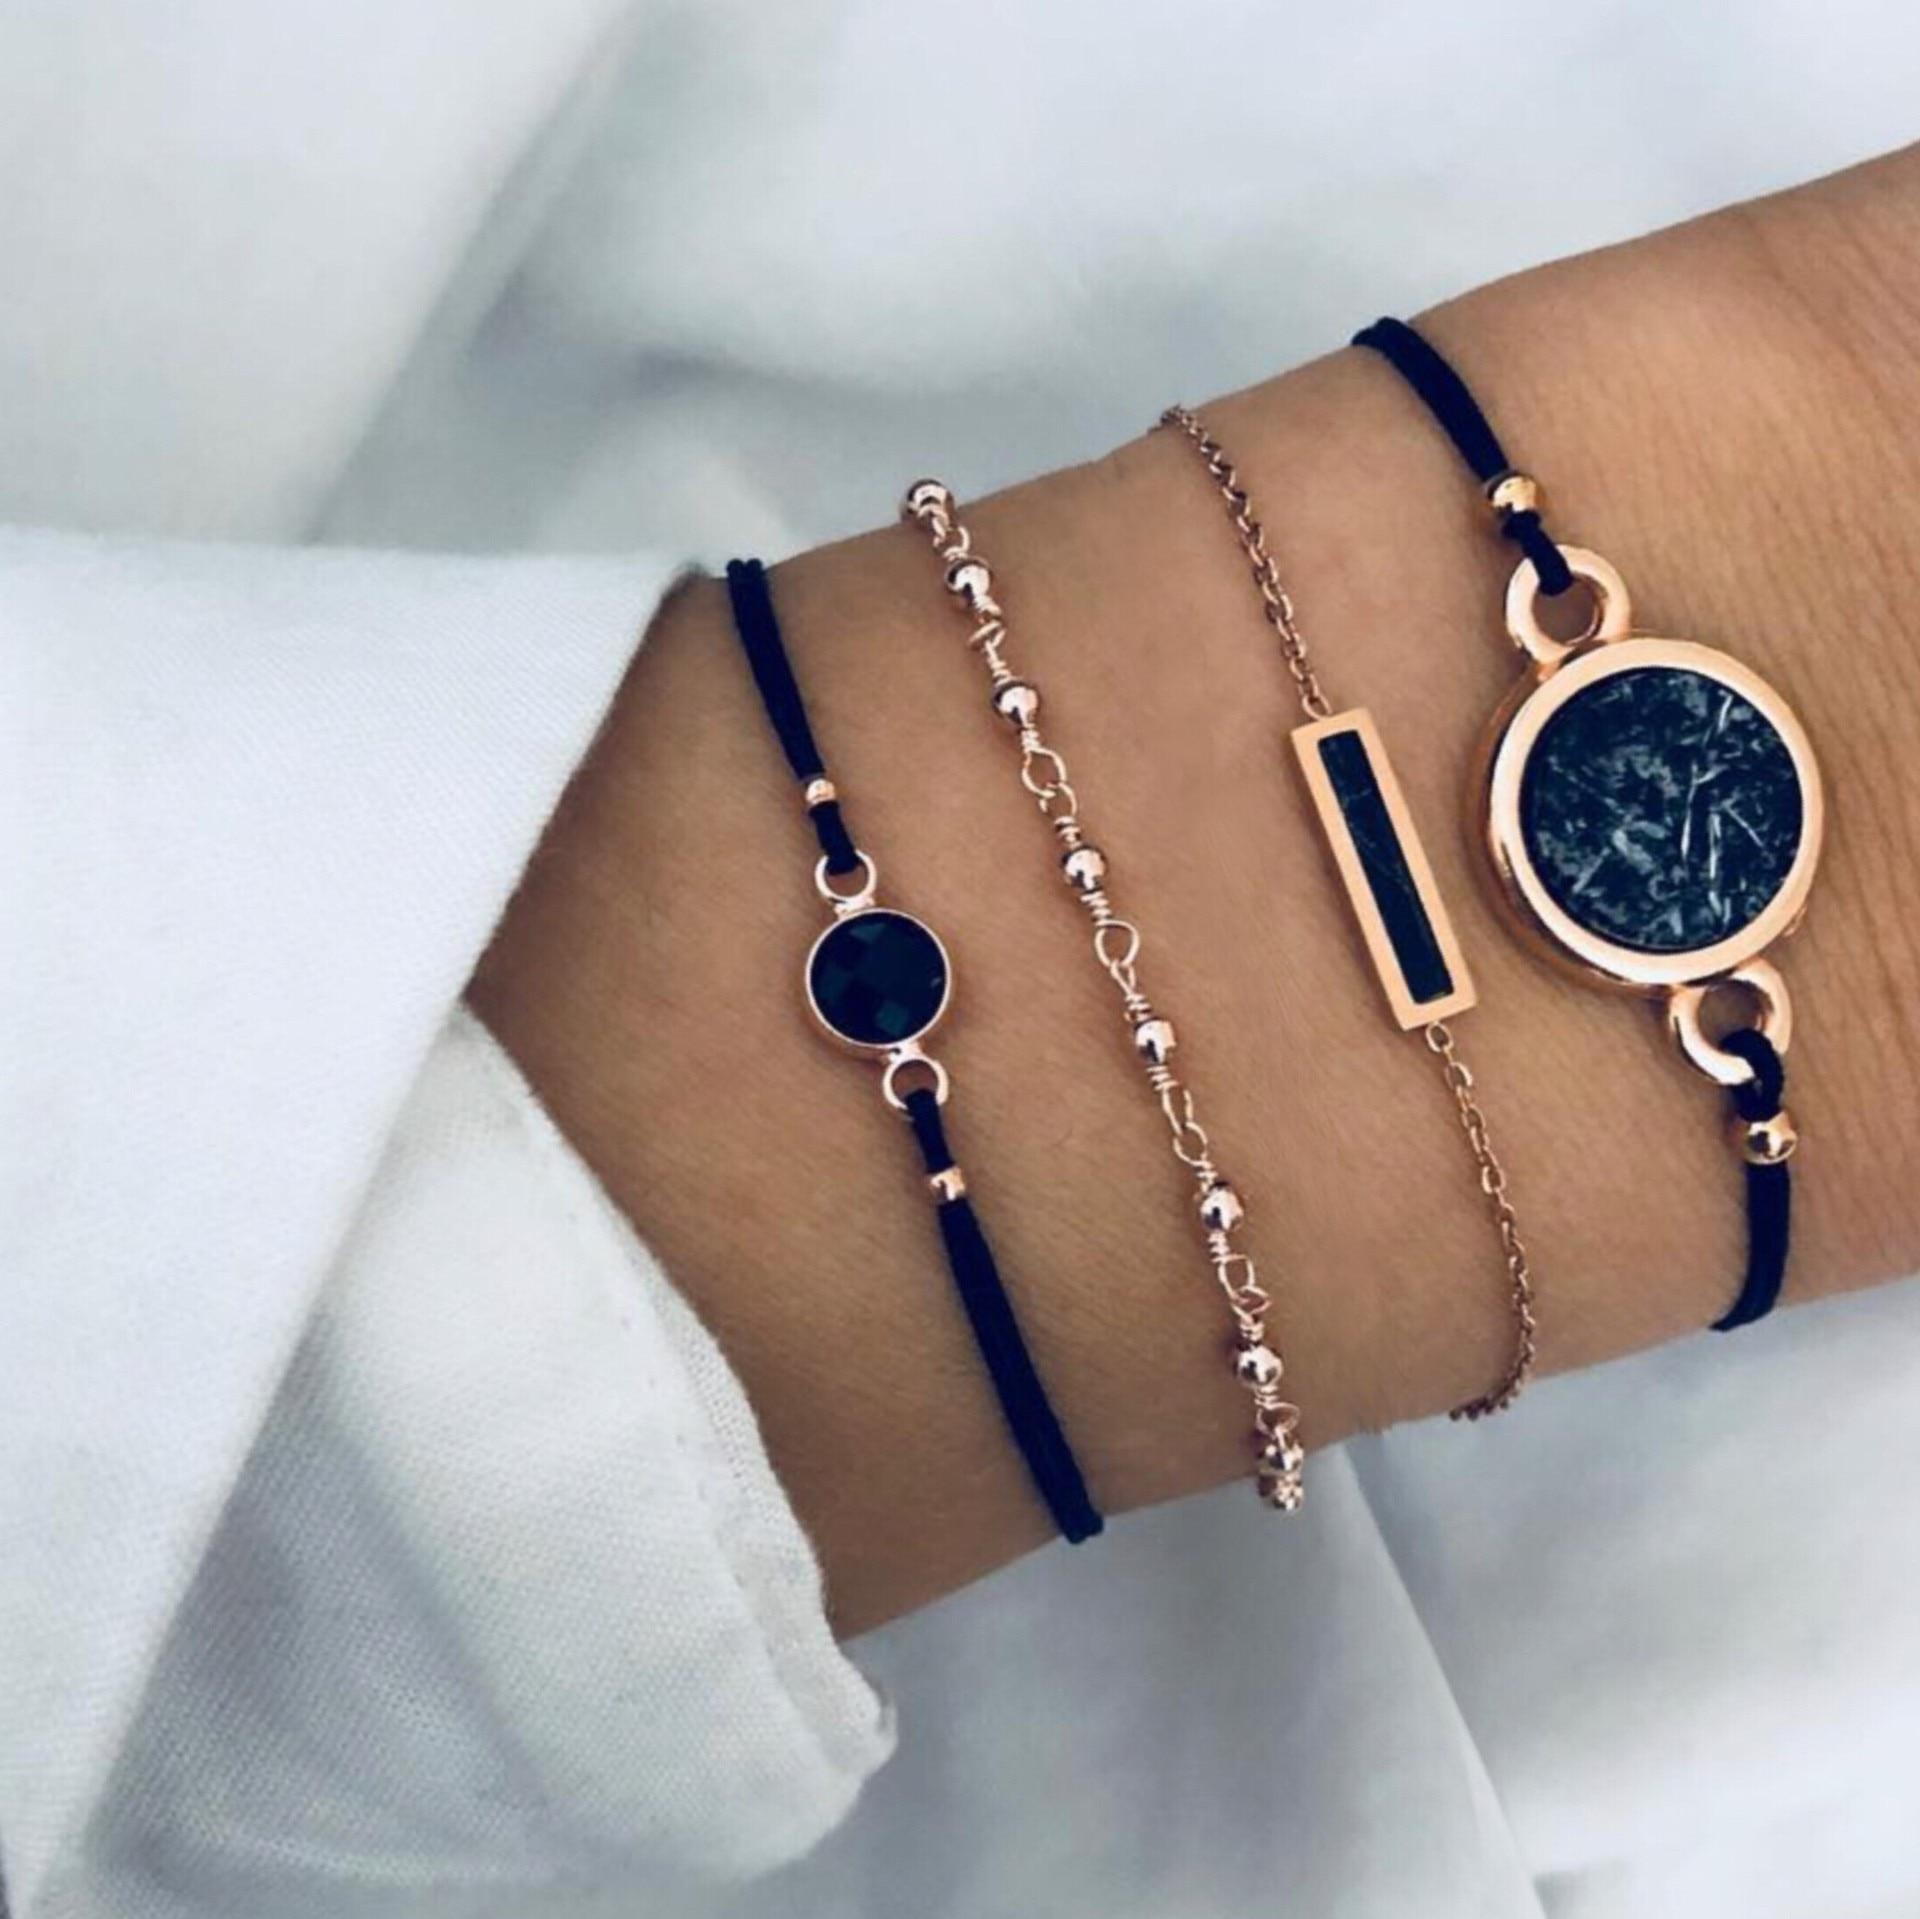 Female Bracelets Round Black Bead Chain